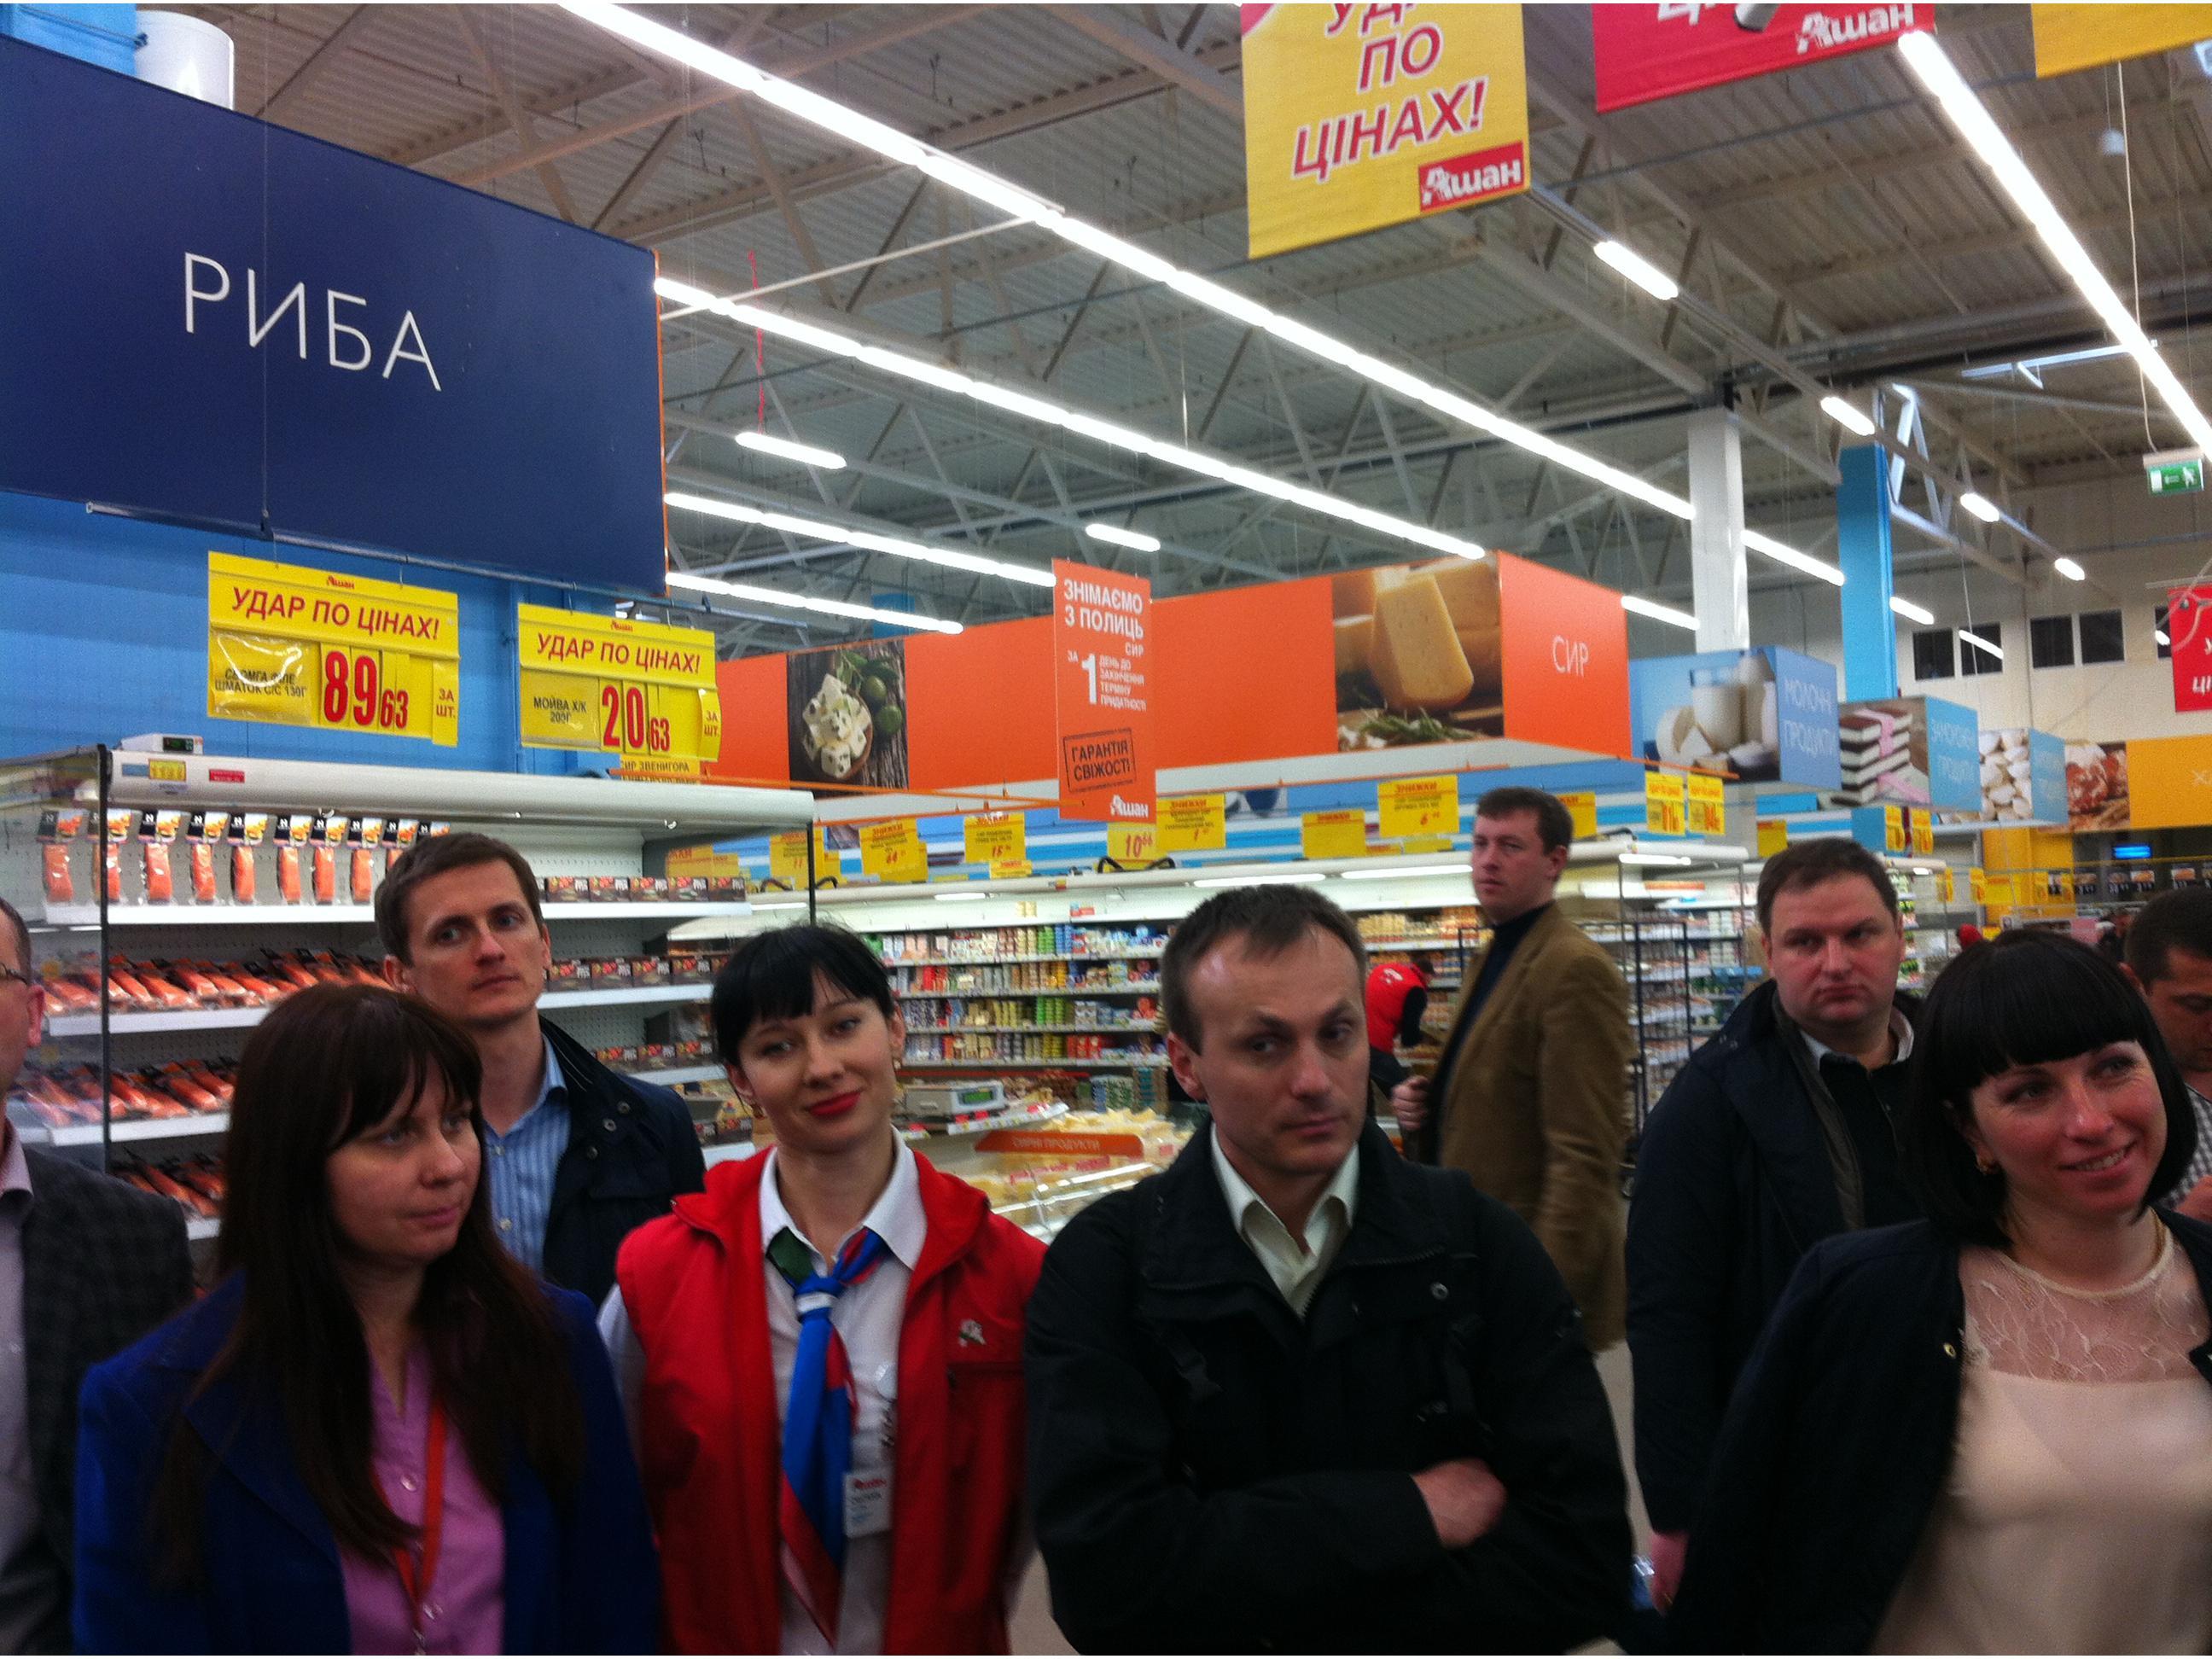 Fruits & vegetables Eastern Europe and Balkan